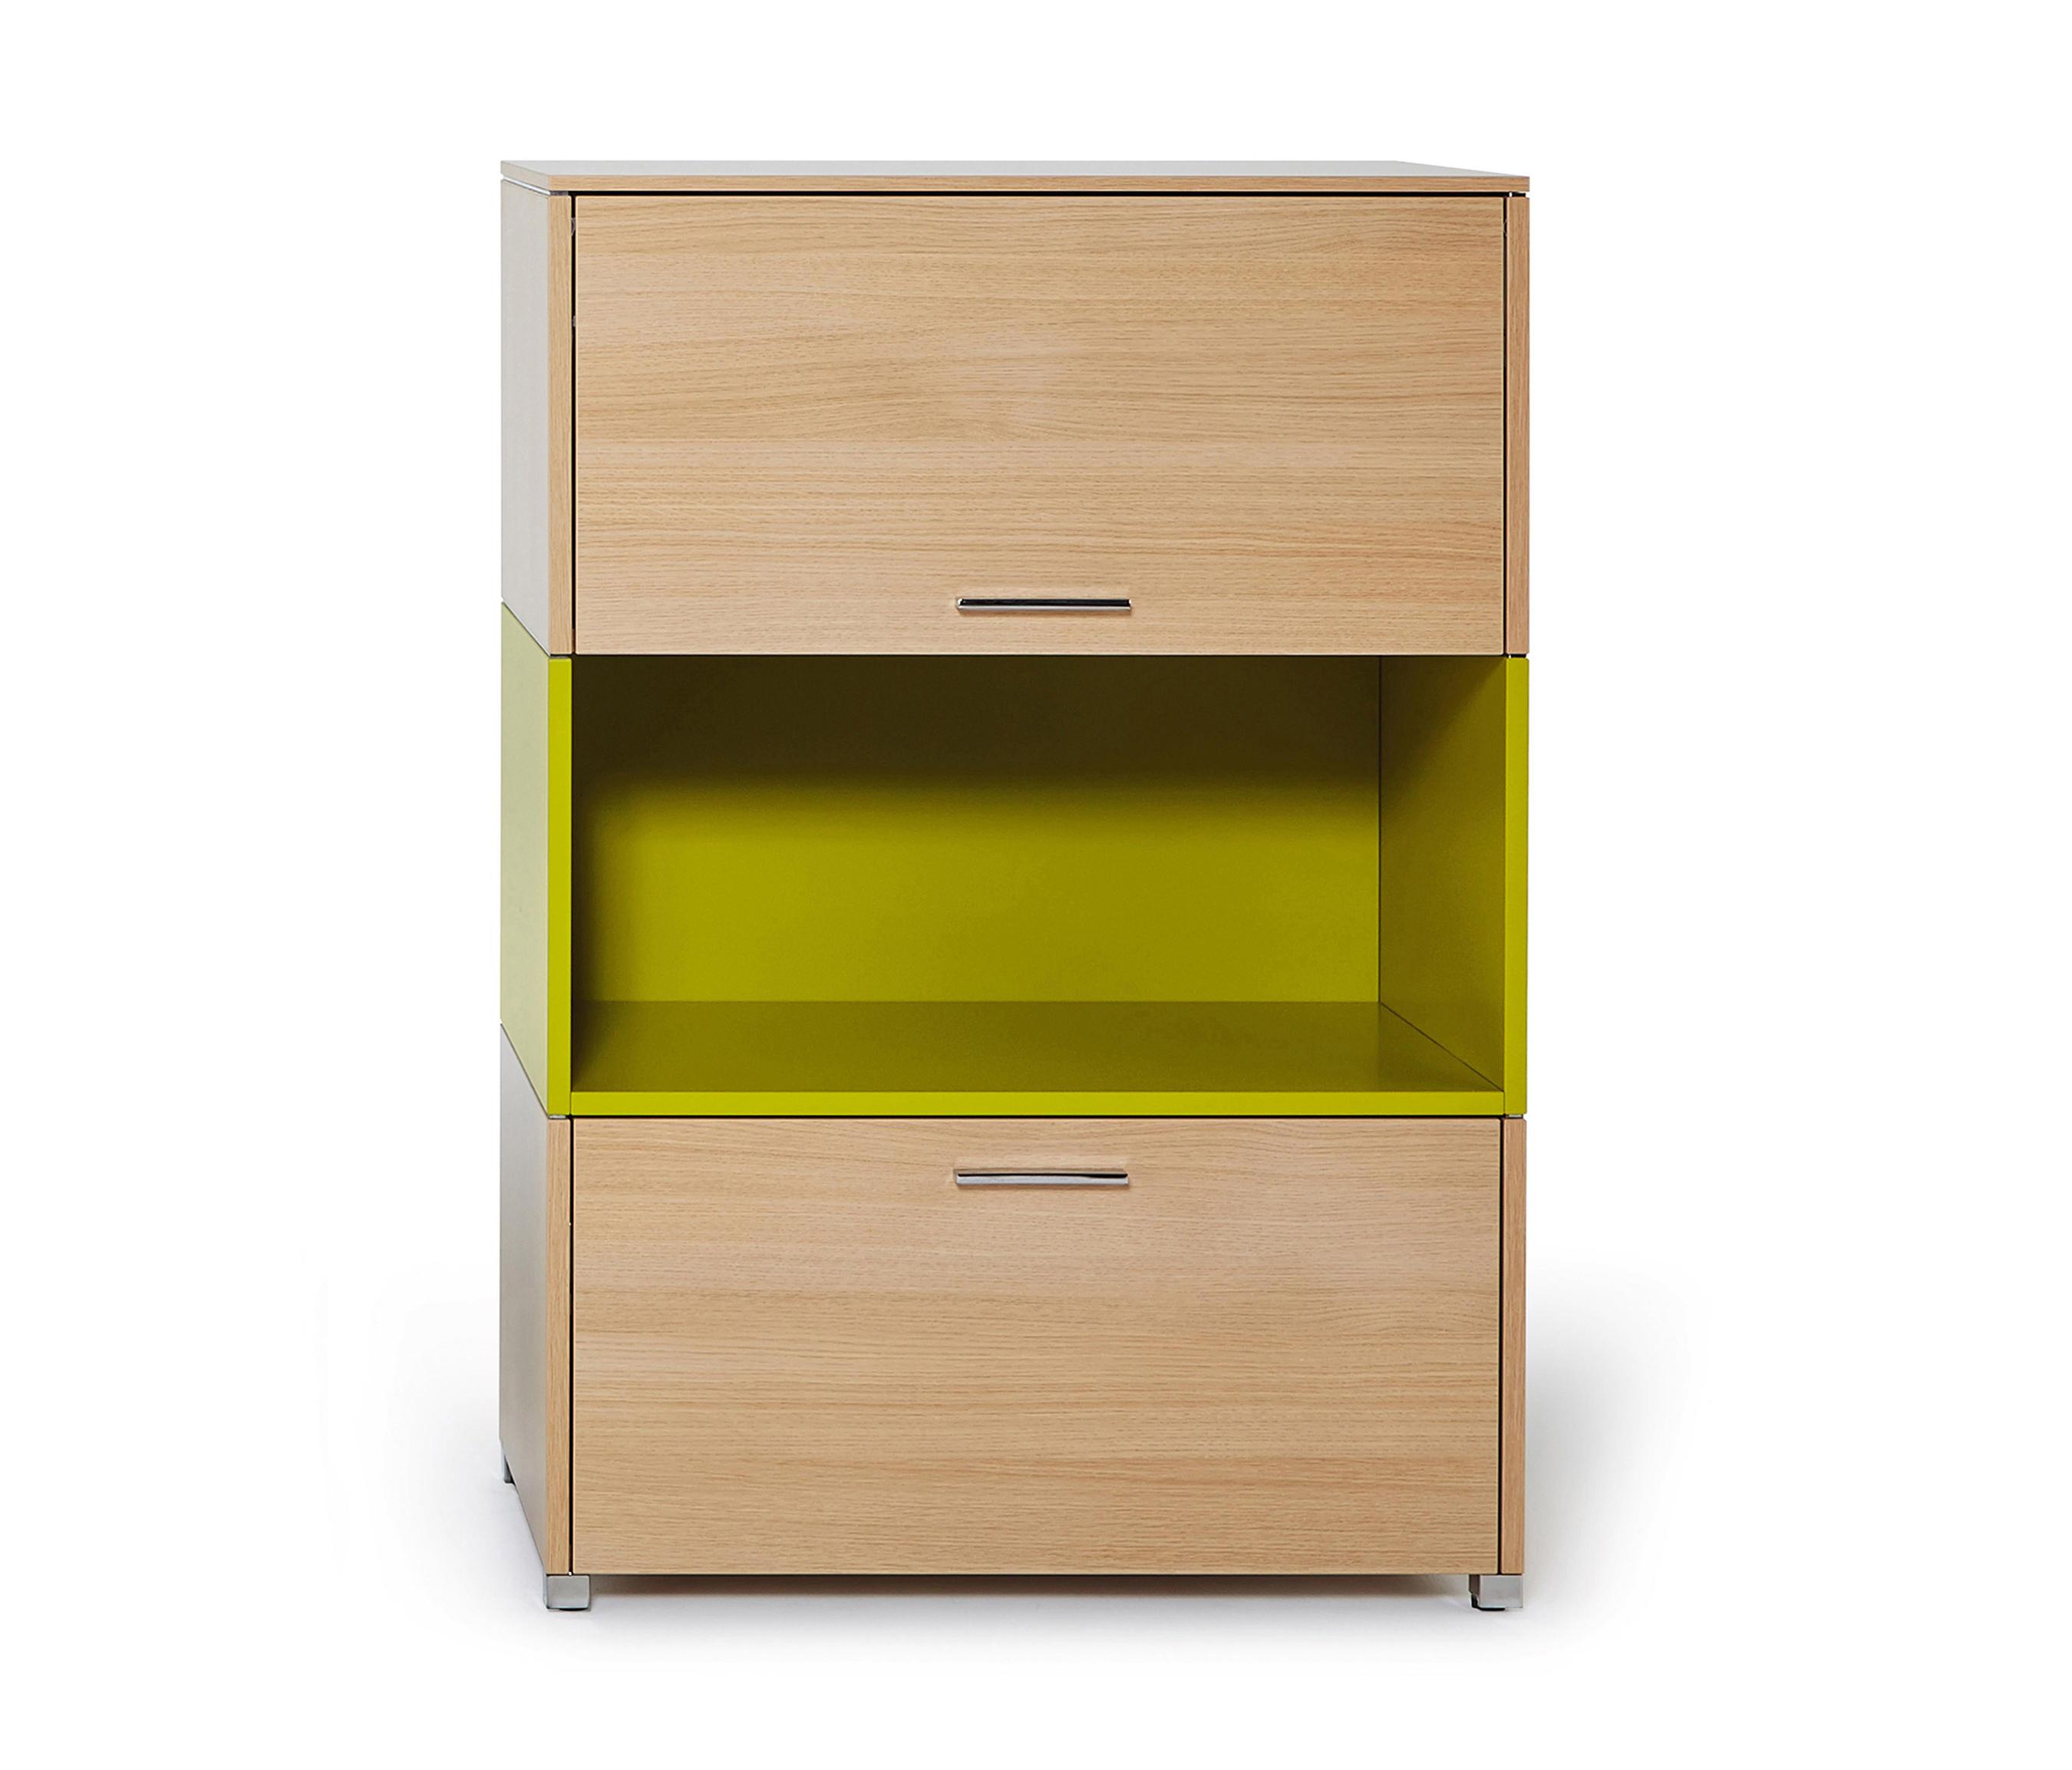 wunderbar h ngeregisterschrank holz zeitgen ssisch die. Black Bedroom Furniture Sets. Home Design Ideas